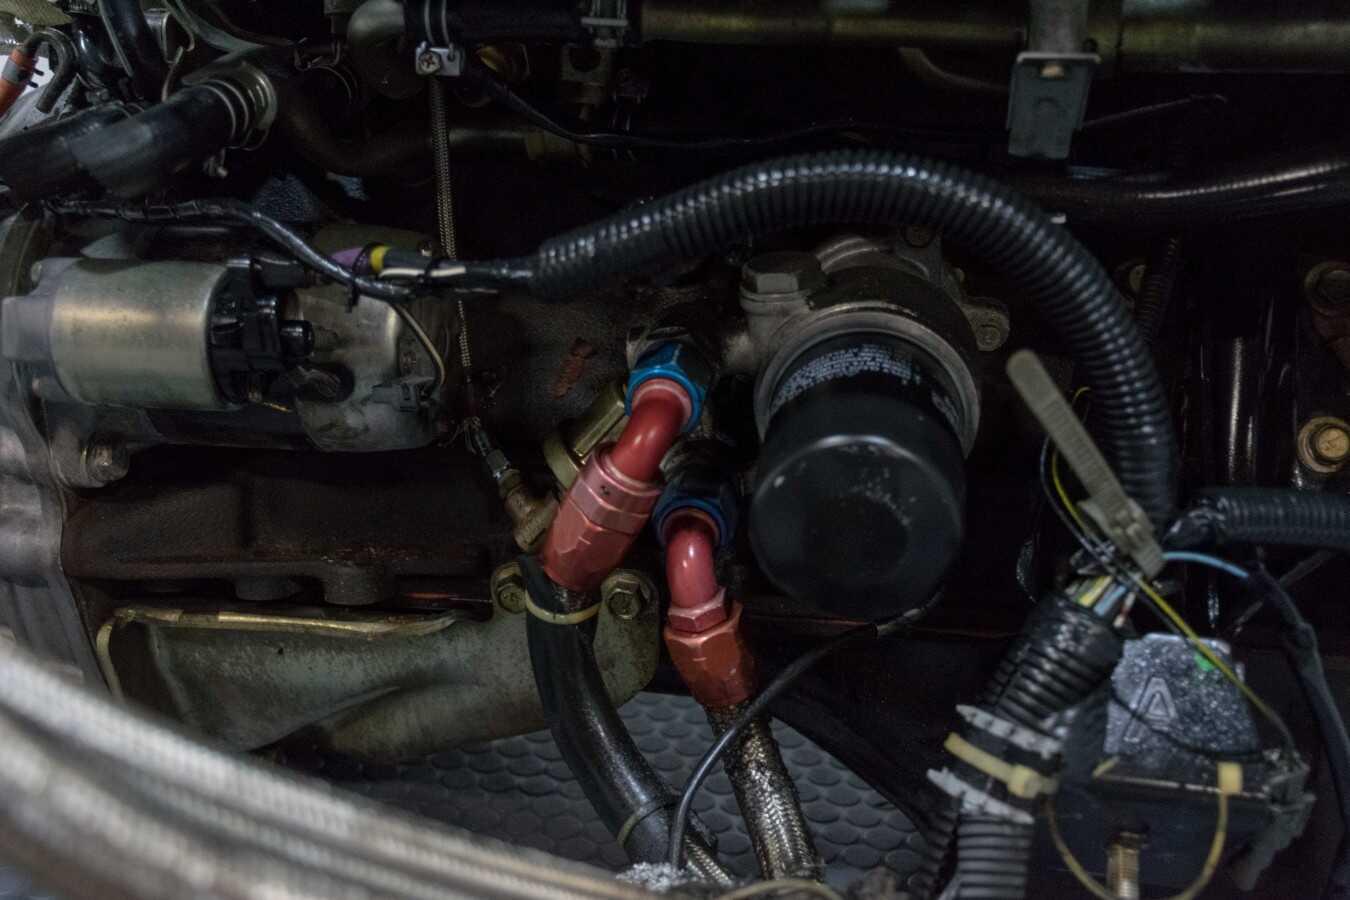 Low Mileage Rb20det Engine For Sale With 5mt Transmission Ecu Rb20 Wiring Harness 1157 Dsc 0170